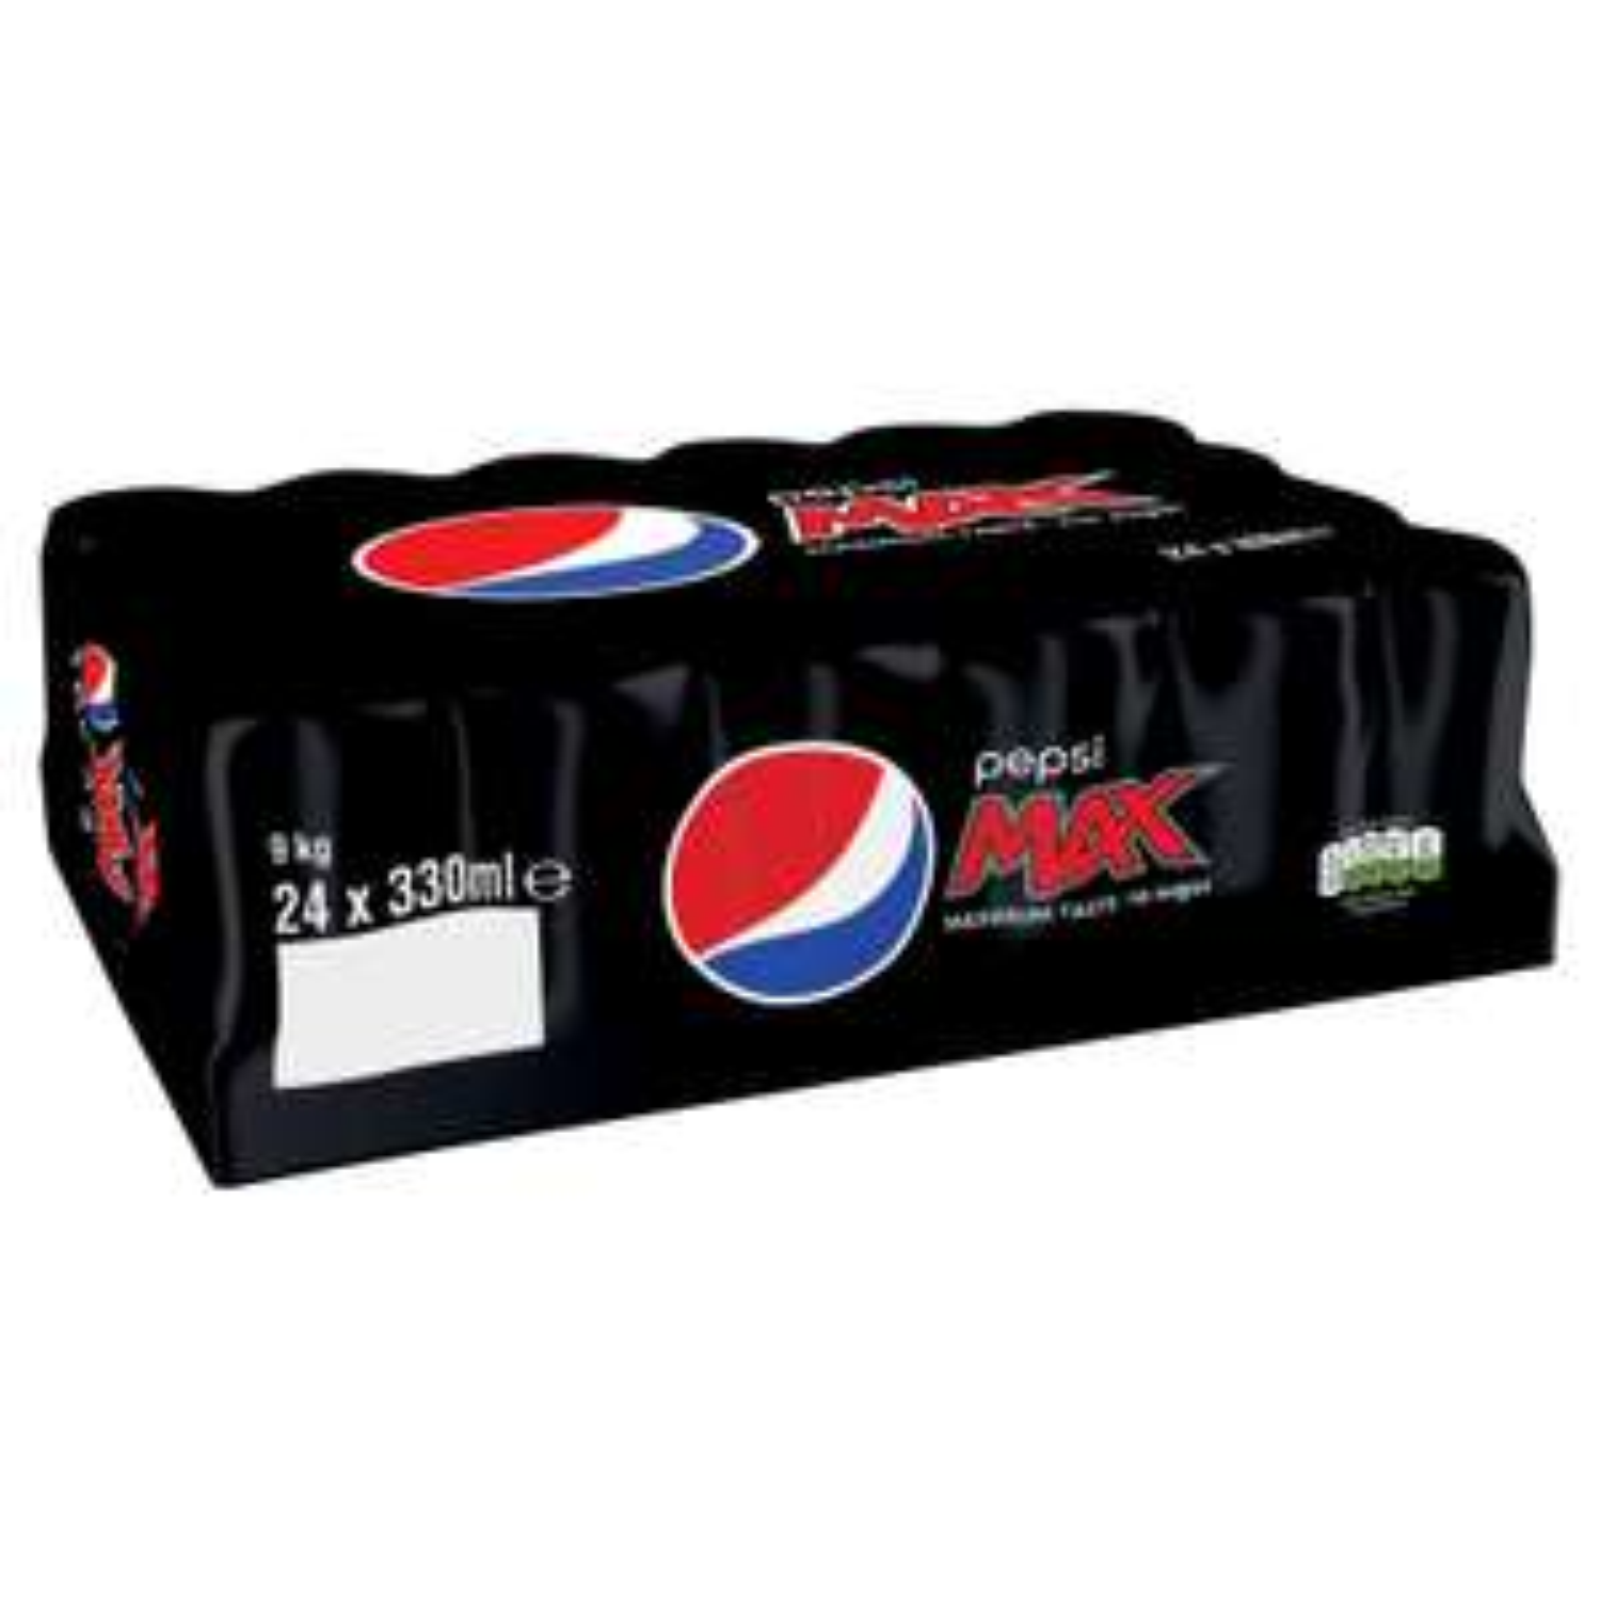 Pepsi Max/7Up/Tango Orange - 24 x 330ml cans - £6 Instore @ Esso (Newton Le Willows)